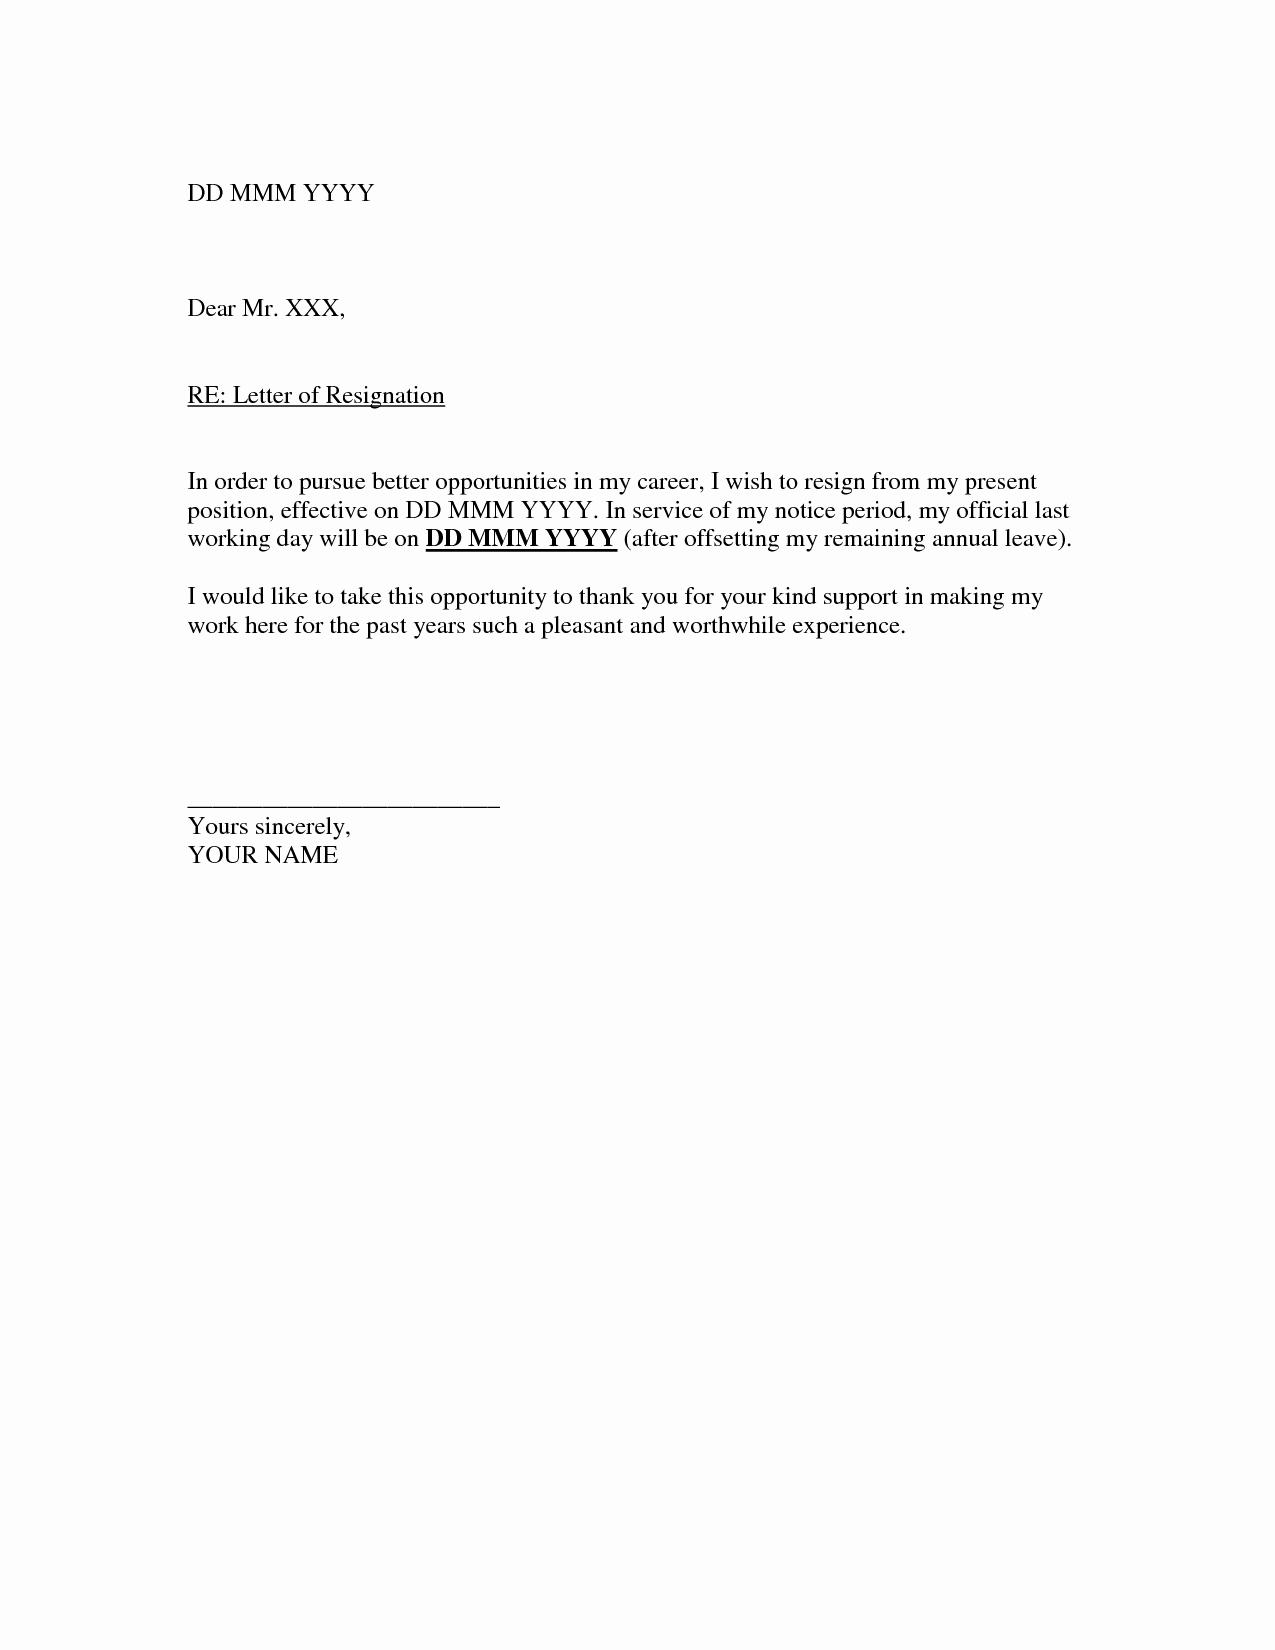 Template for Resignation Letter Unique Resignation Letter Template